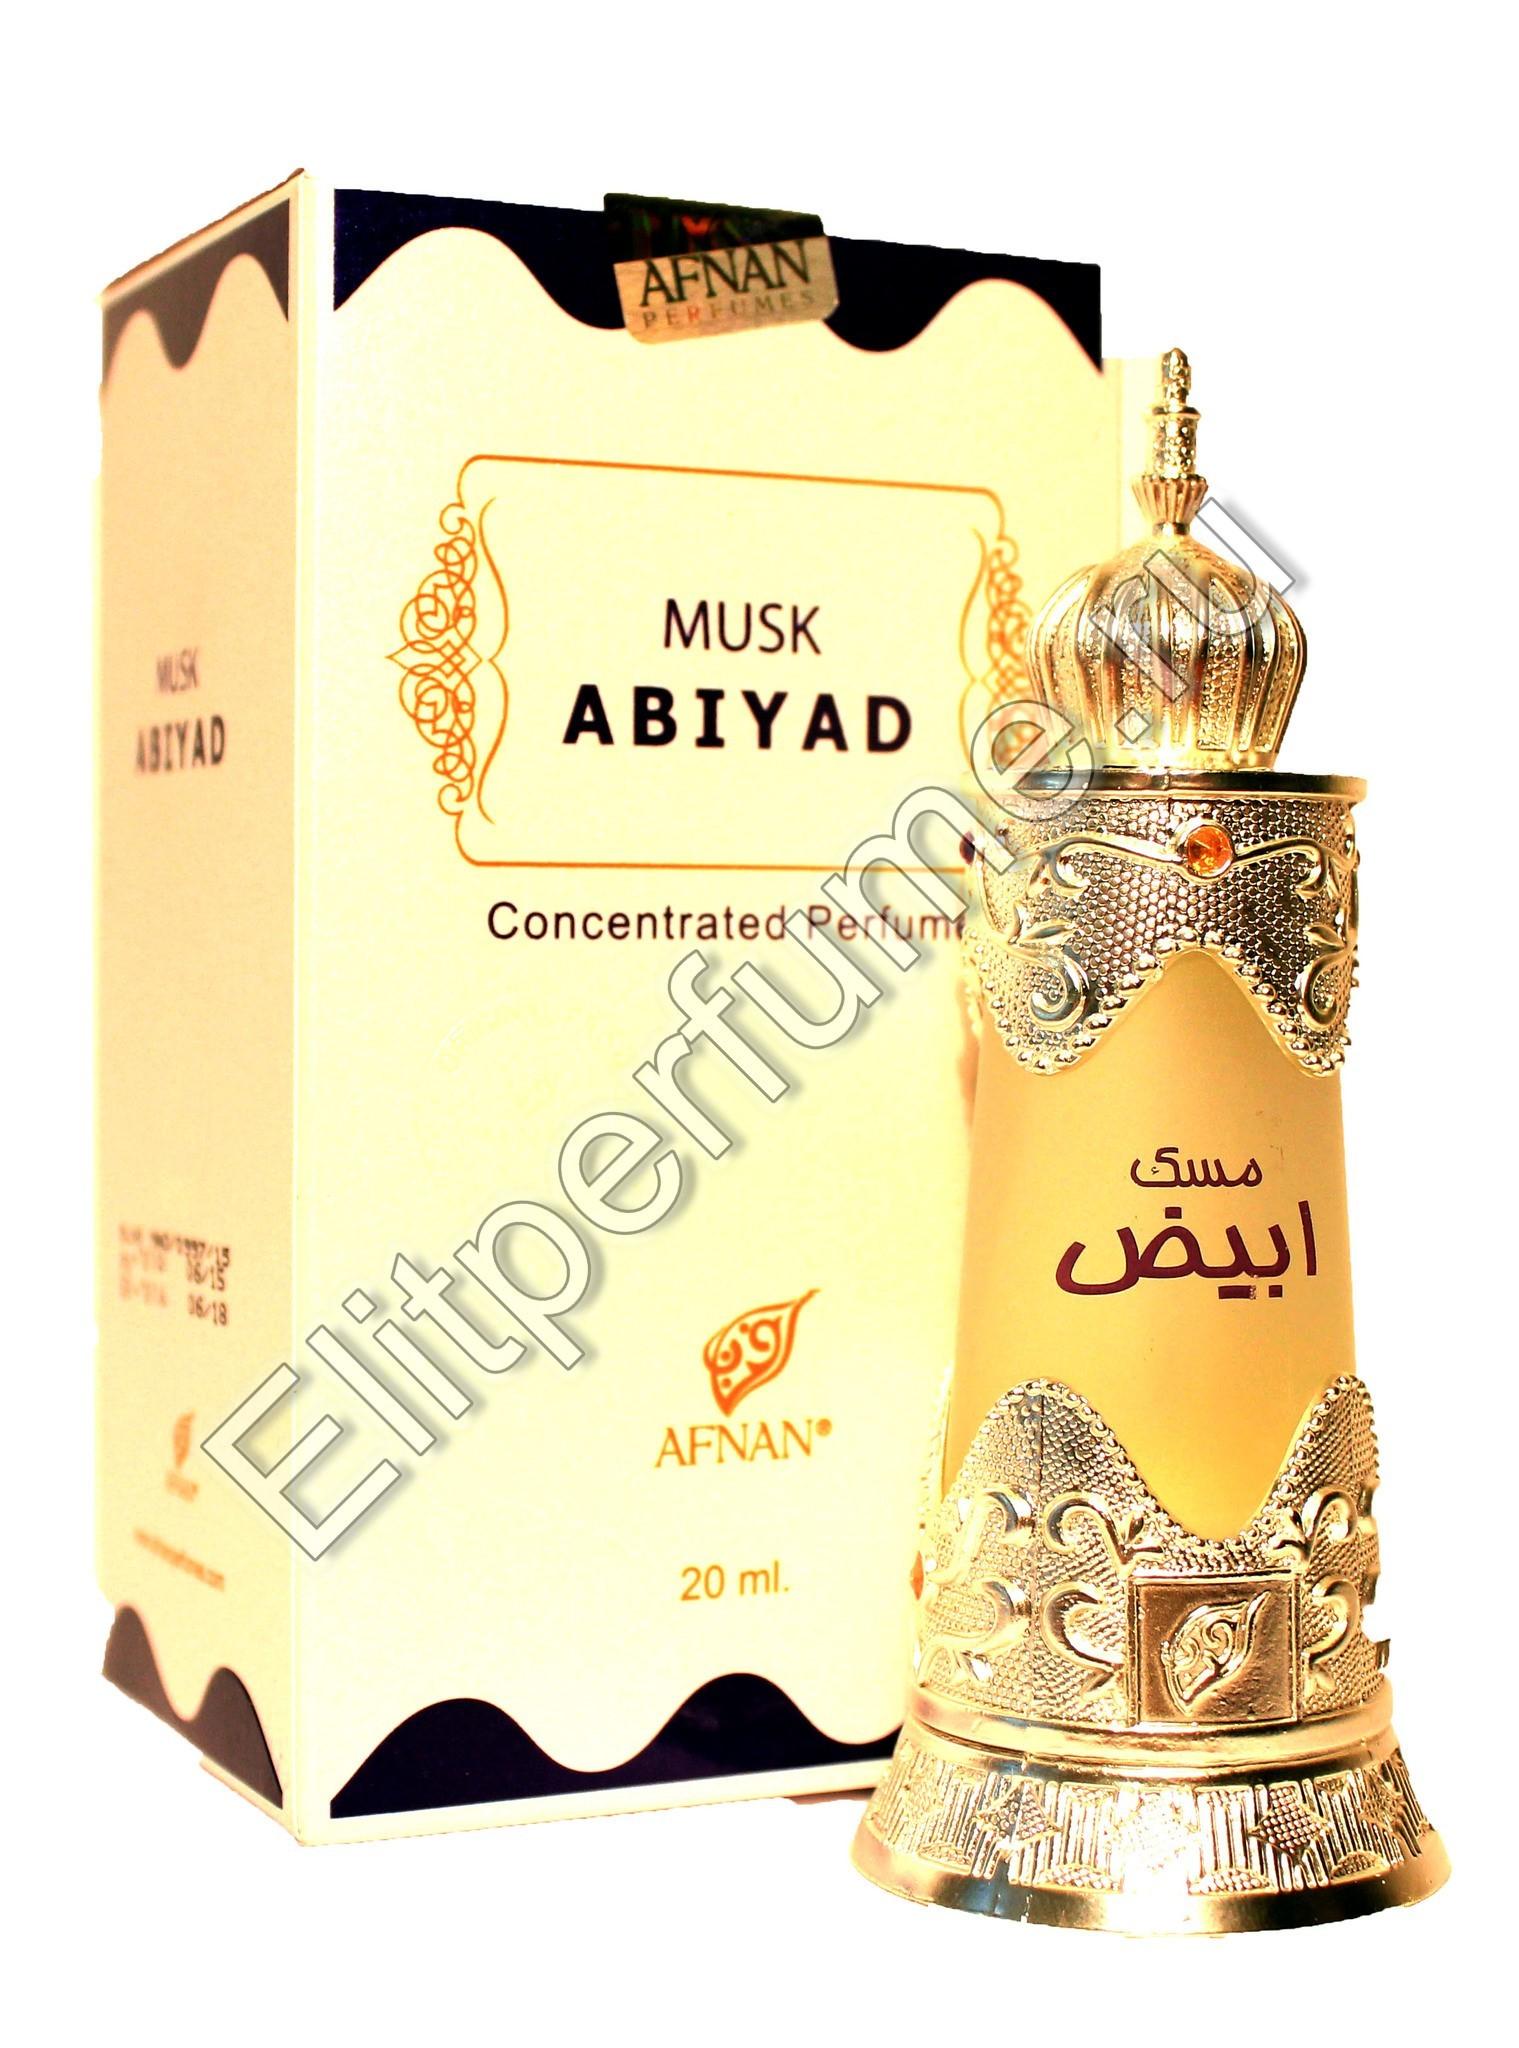 Musk Abiyad  Муск Абияд 20 мл арабские мужские масляные духи от Афнан Парфюм Afnan Perfumes